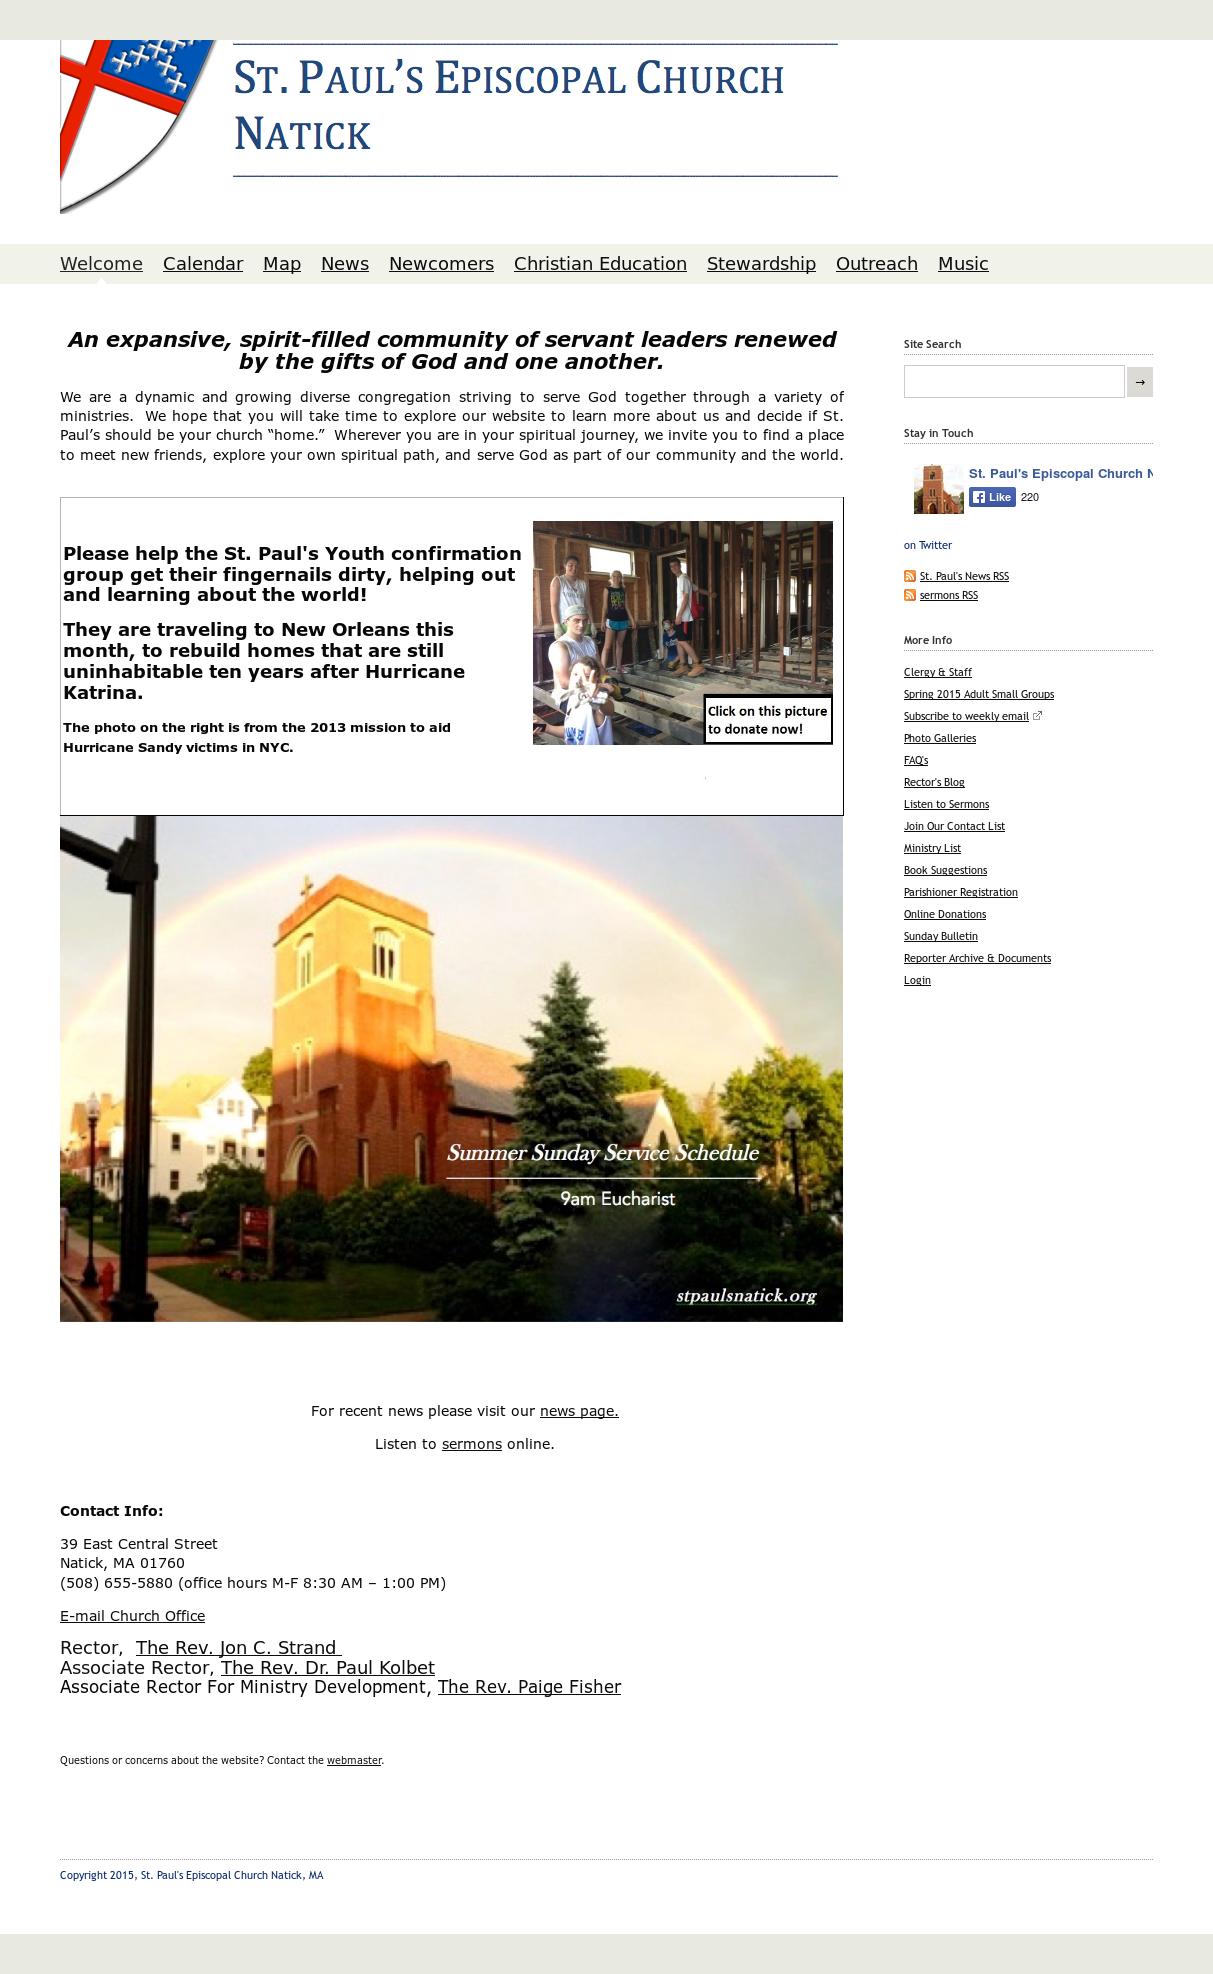 St  Paul's Episcopal Church Natick Competitors, Revenue and